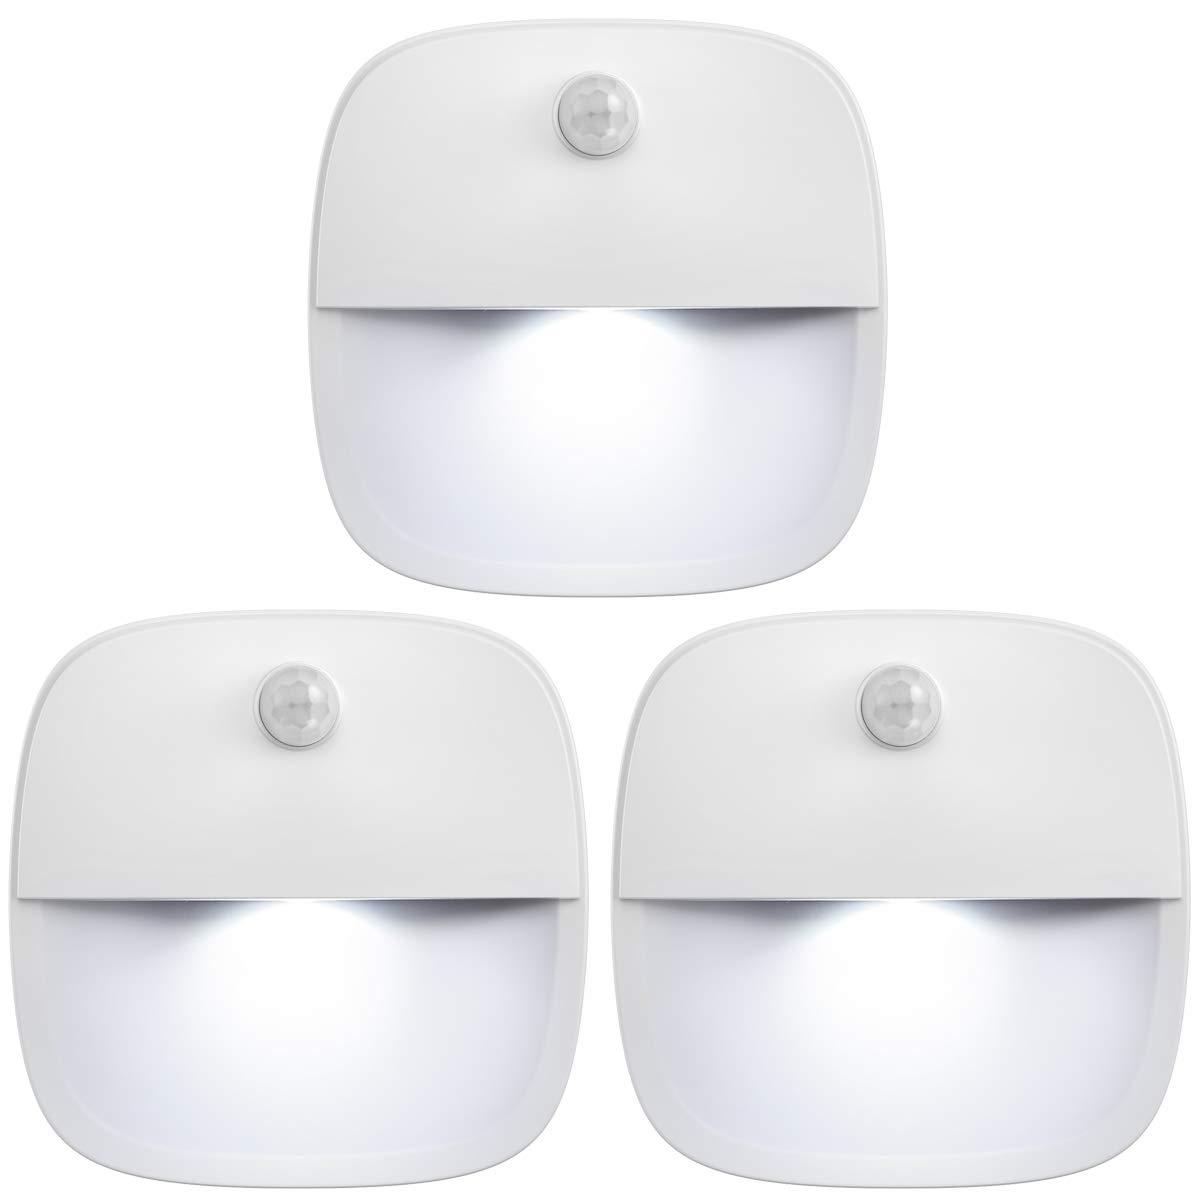 AMIR Upgraded Motion Sensor Light, Cordless Battery-Powered LED Night Light, Wall Light, Closet Lights, Safe Lights for Stairs, Hallway, Bathroom, Kitchen, Cabinet (White - Pack of 3)